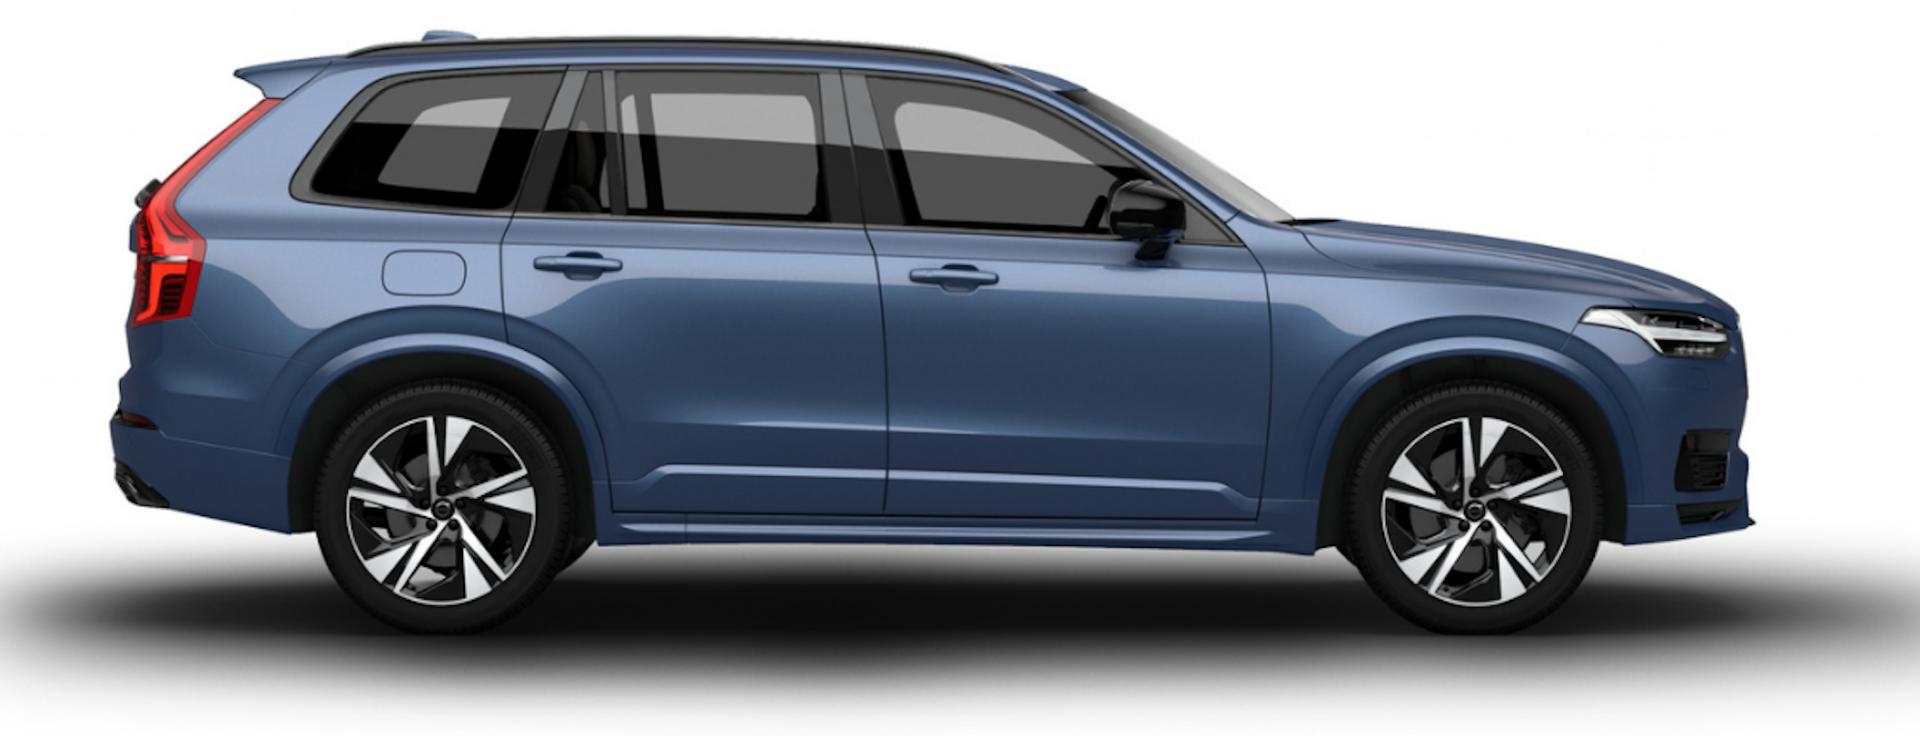 Комплект аксессуаров Basic для Volvo XC90 фото